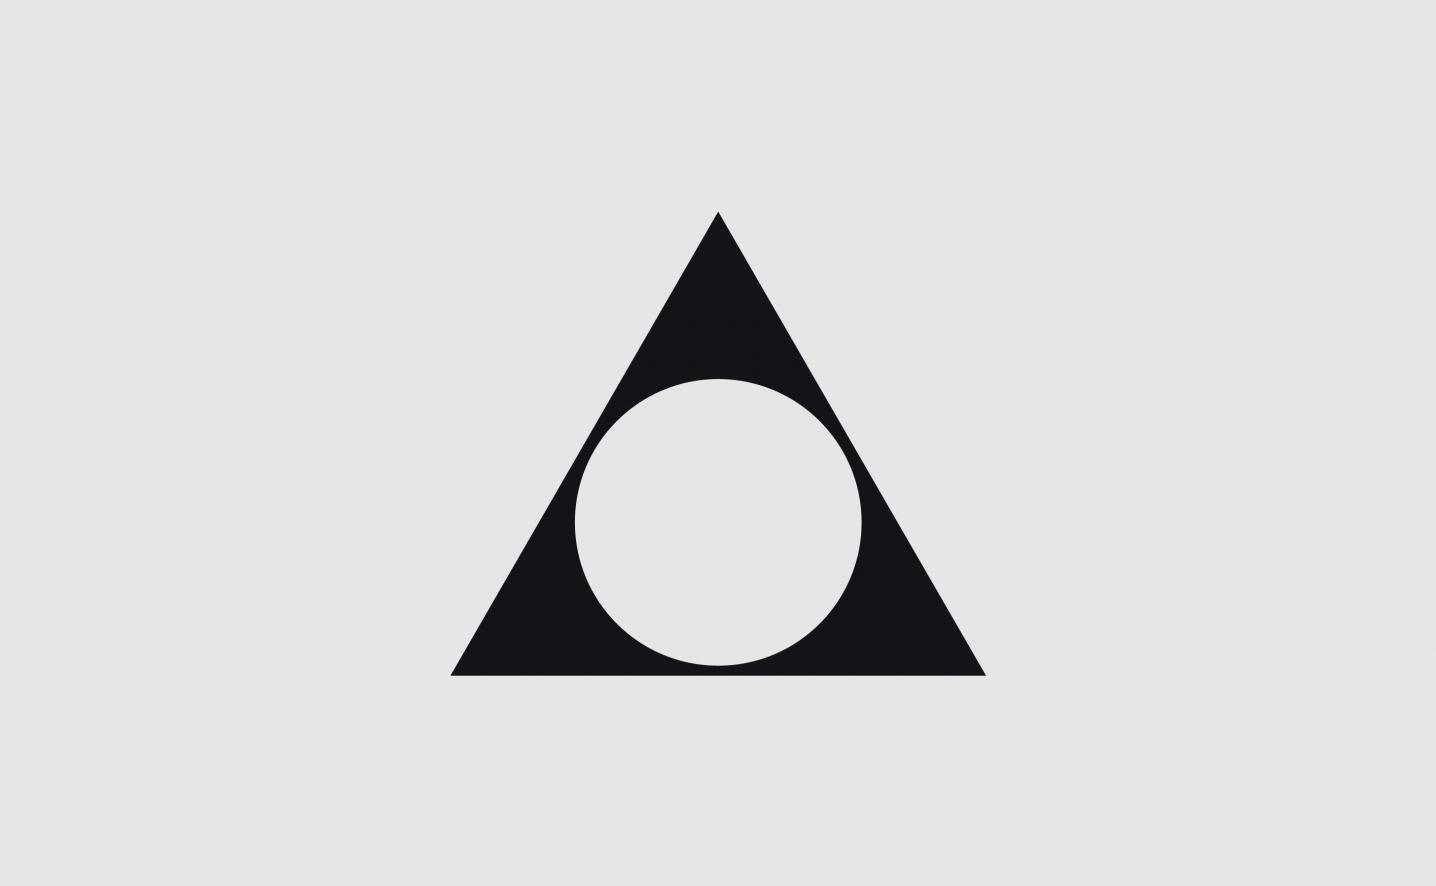 origine-art-logo-design-01